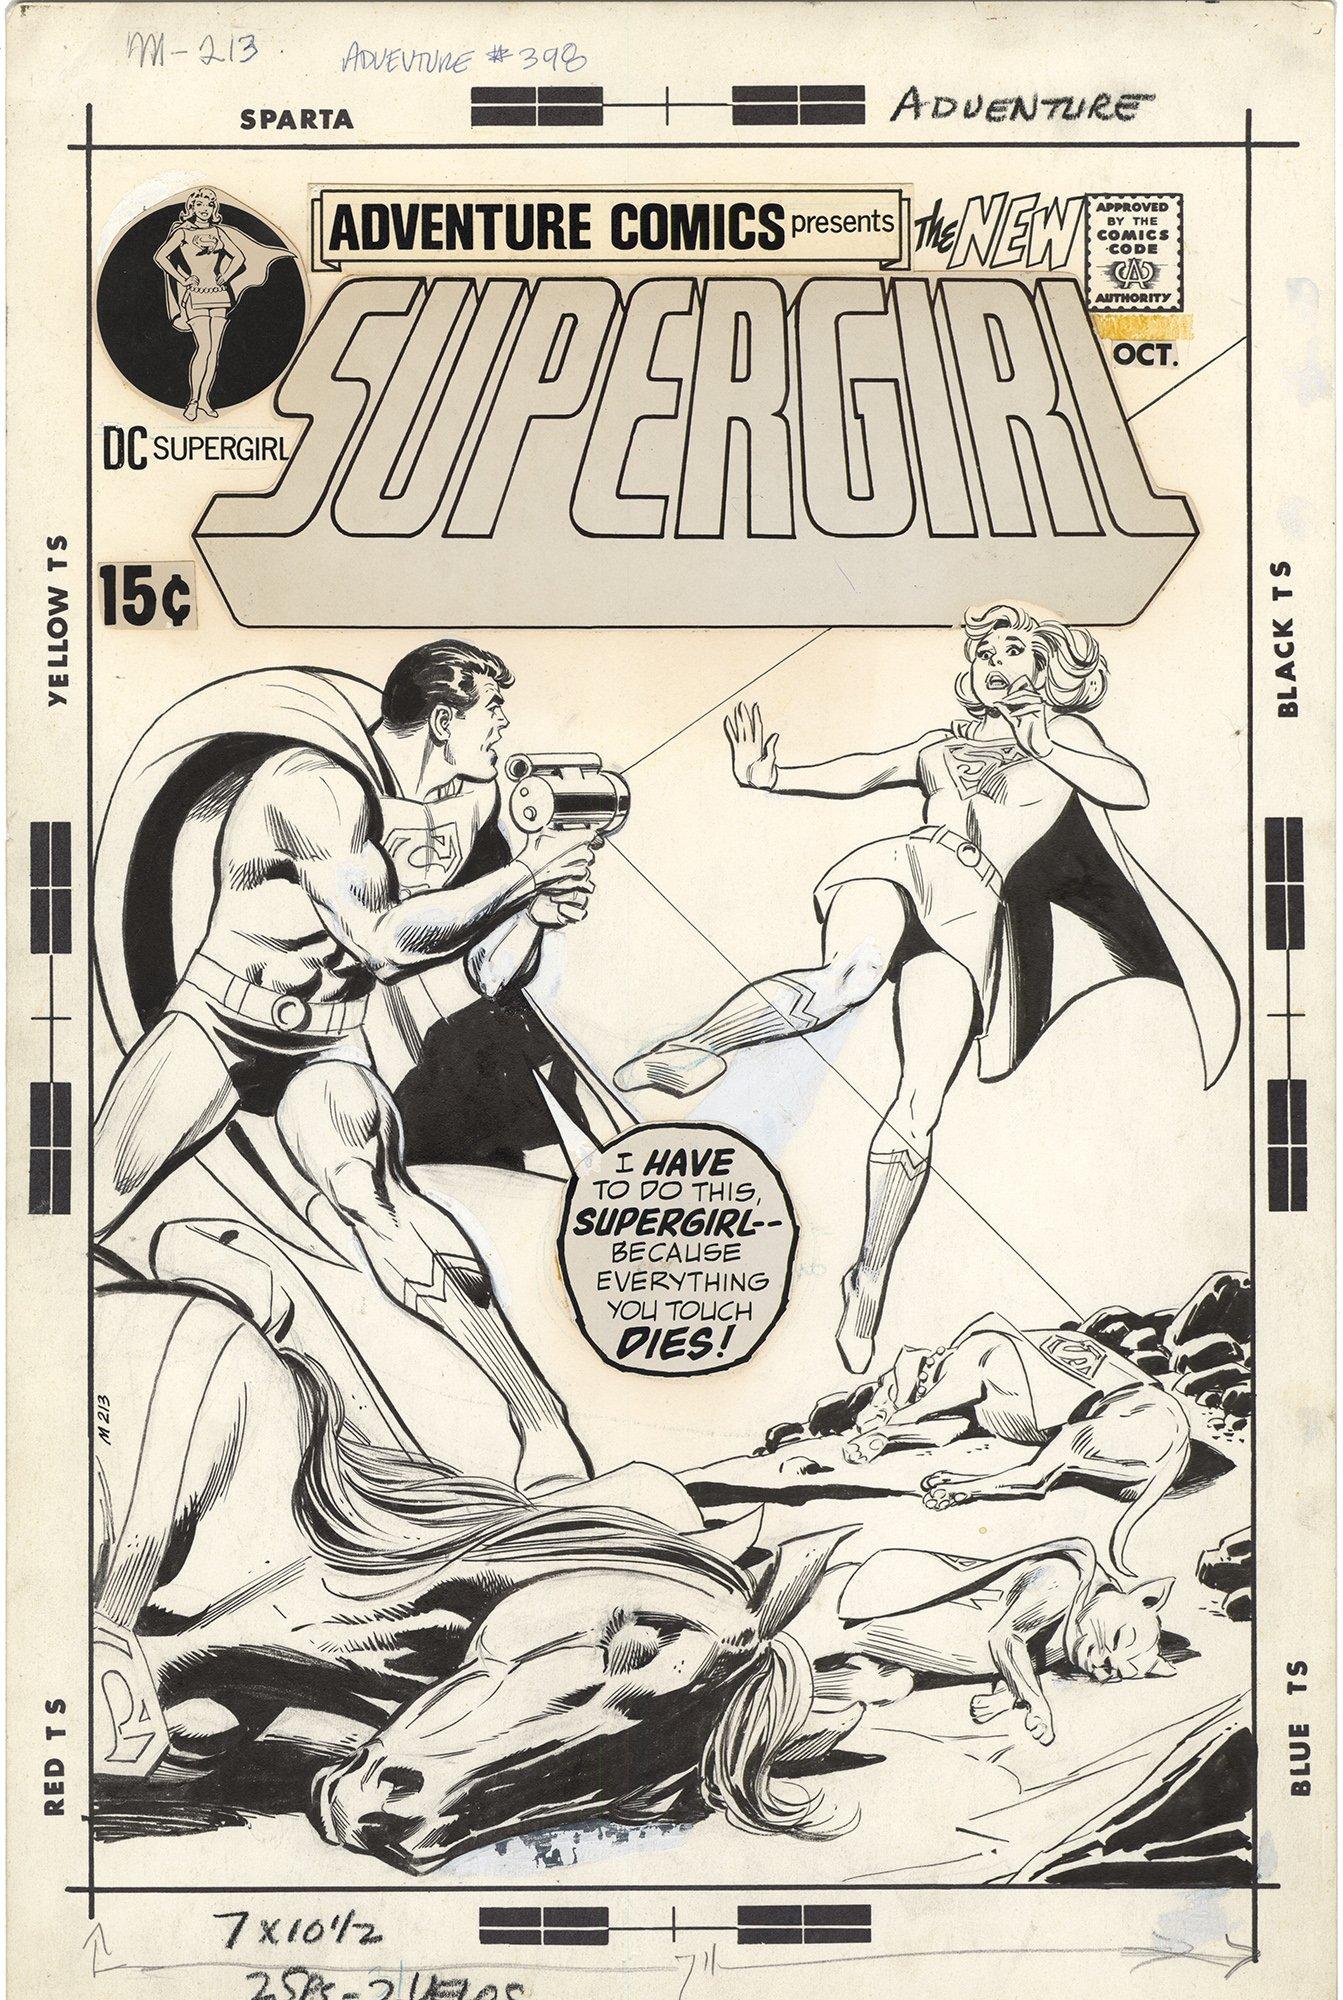 Adventure Comics #398 Cover